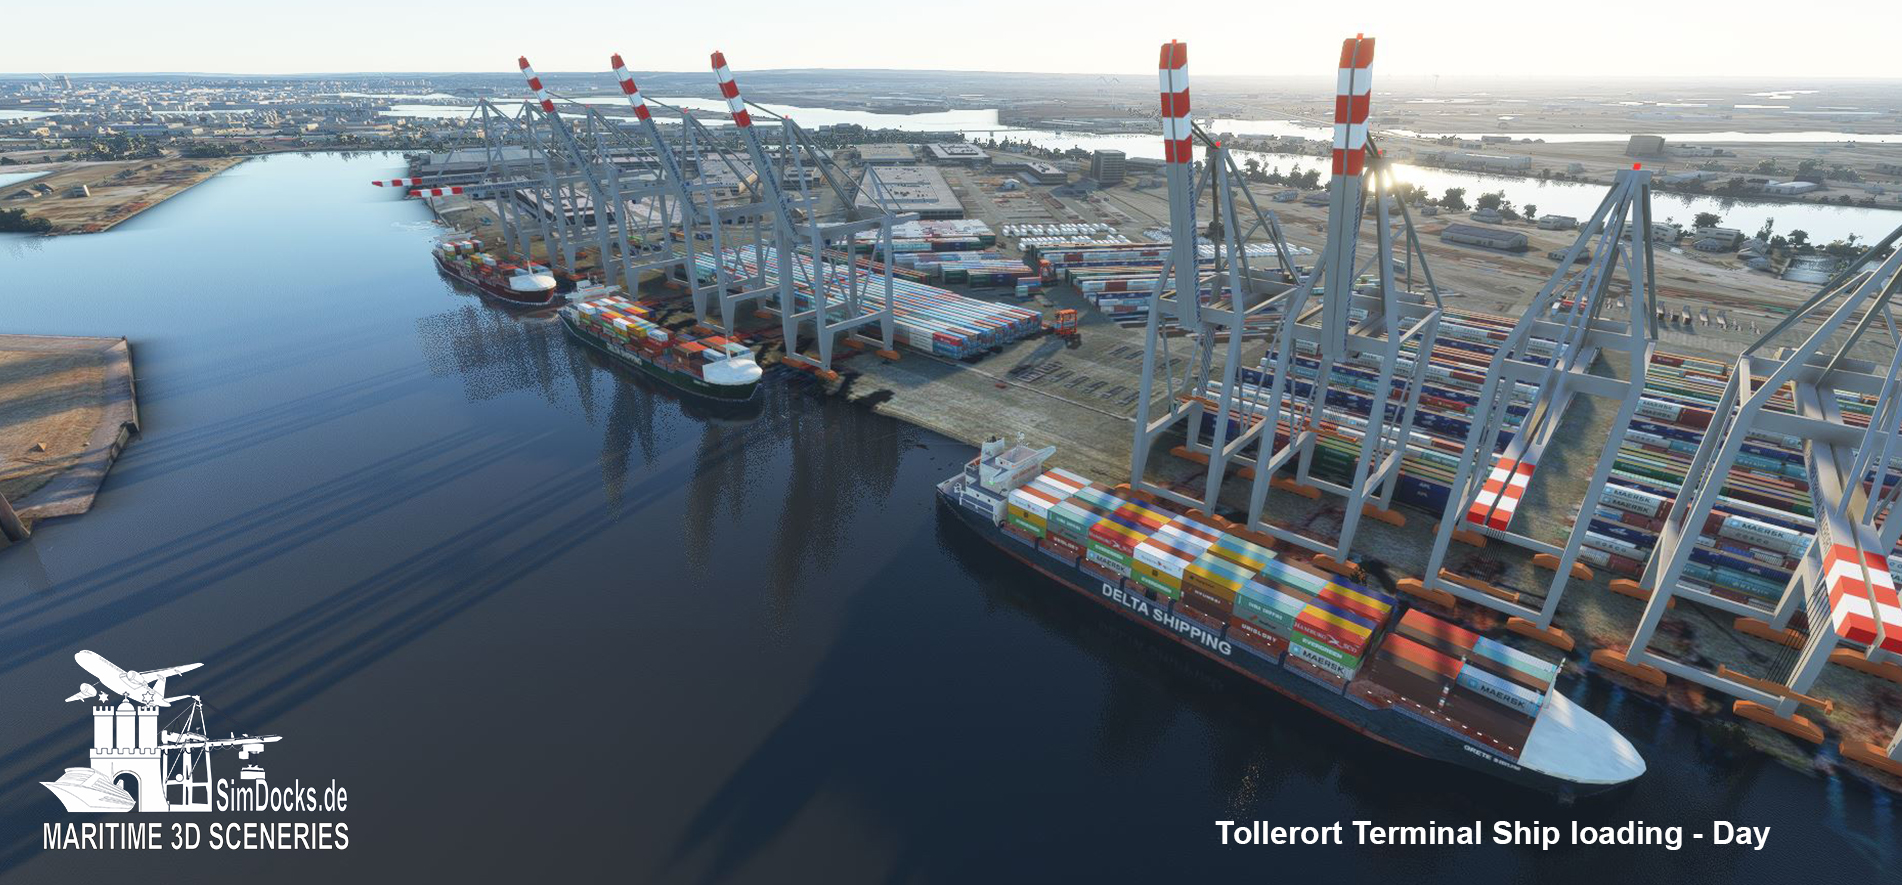 Bild18_Terminal_Tollerort_Schiffsverladung_Tag.JPG